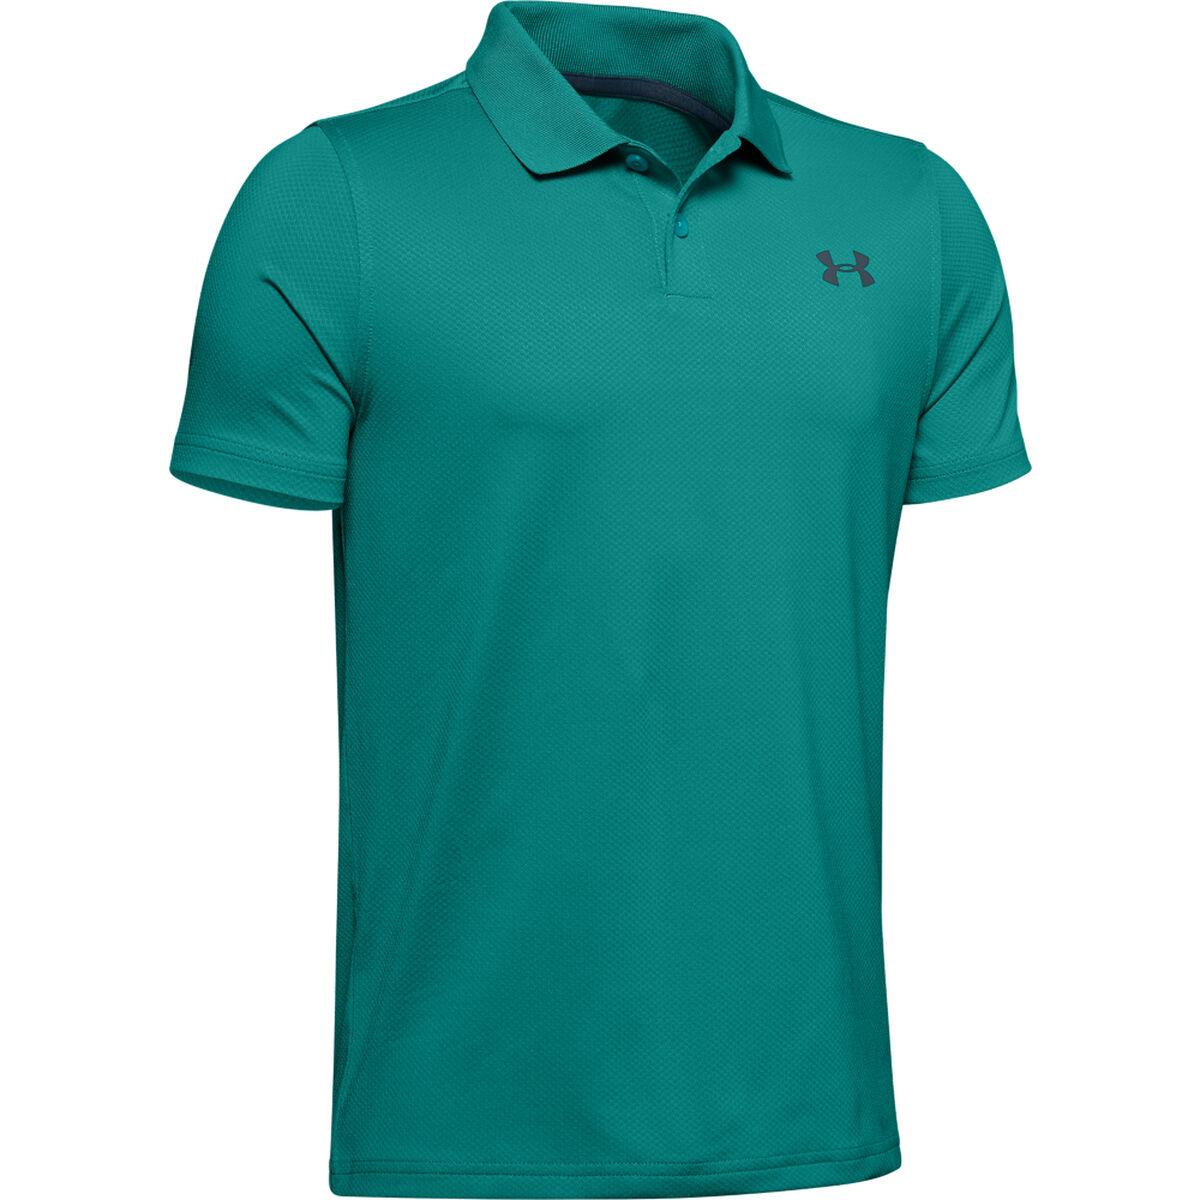 7b48569d Performance Textured Boys' Golf Polo Shirt